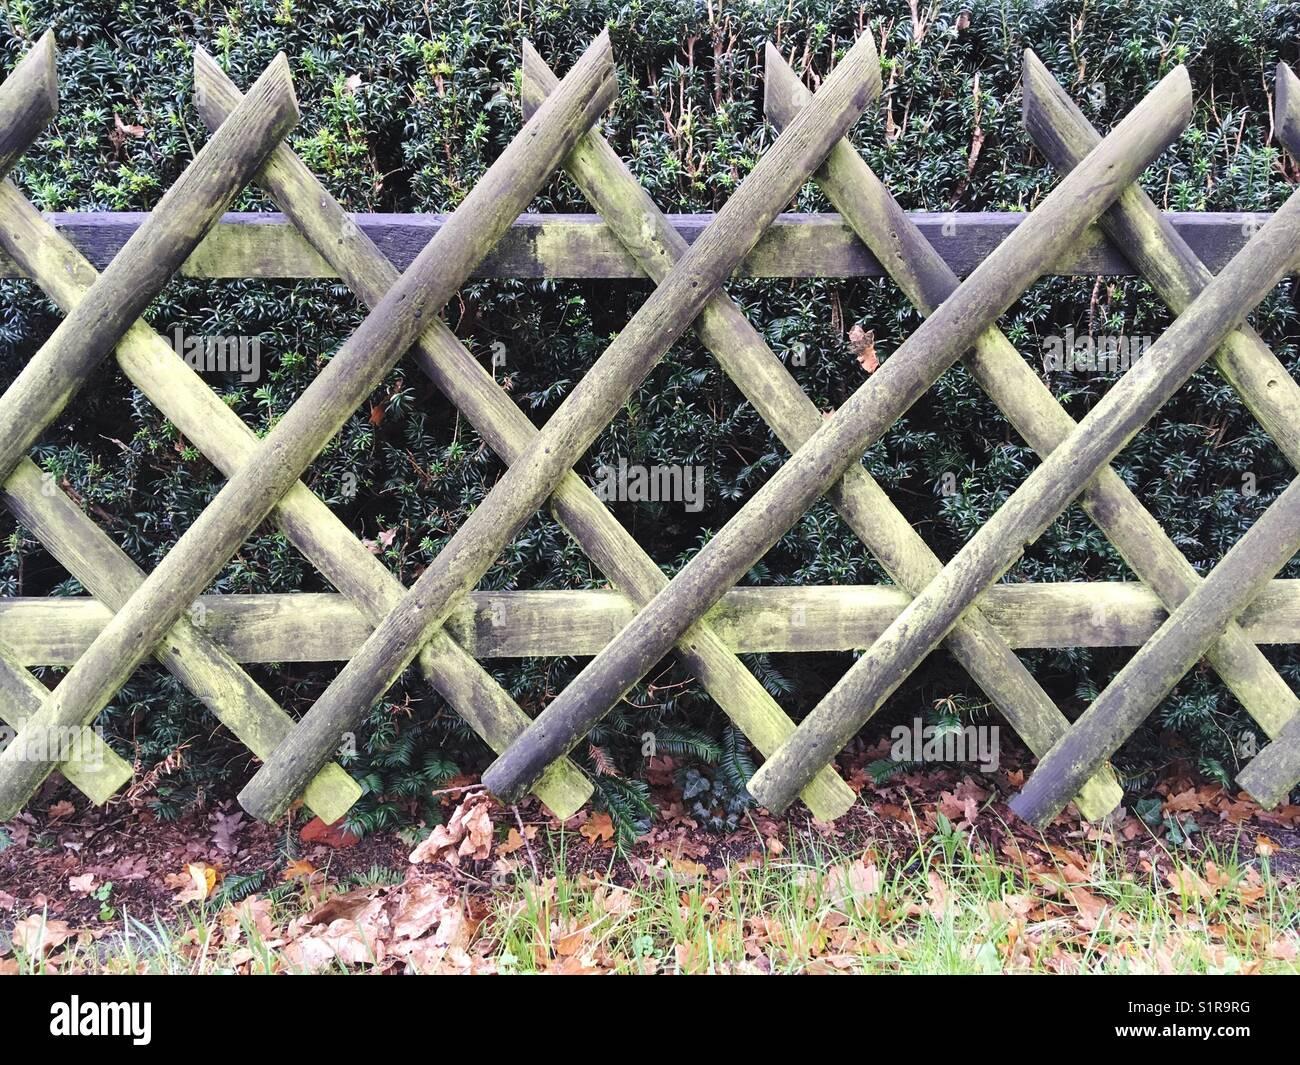 Wooden Lattice Fence   Stock Image